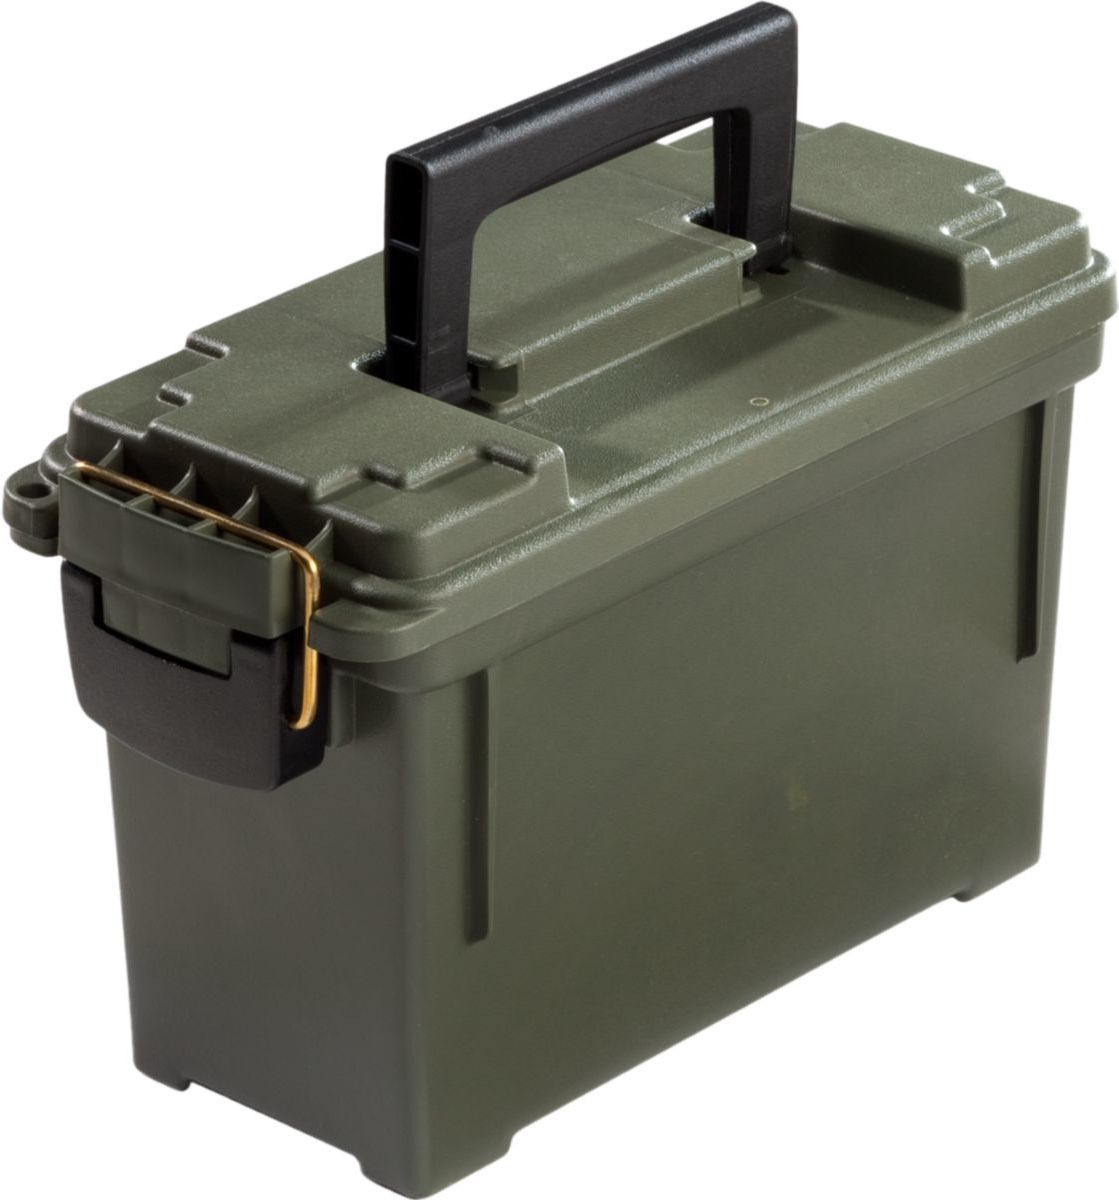 Cabela's Universal Storage Box